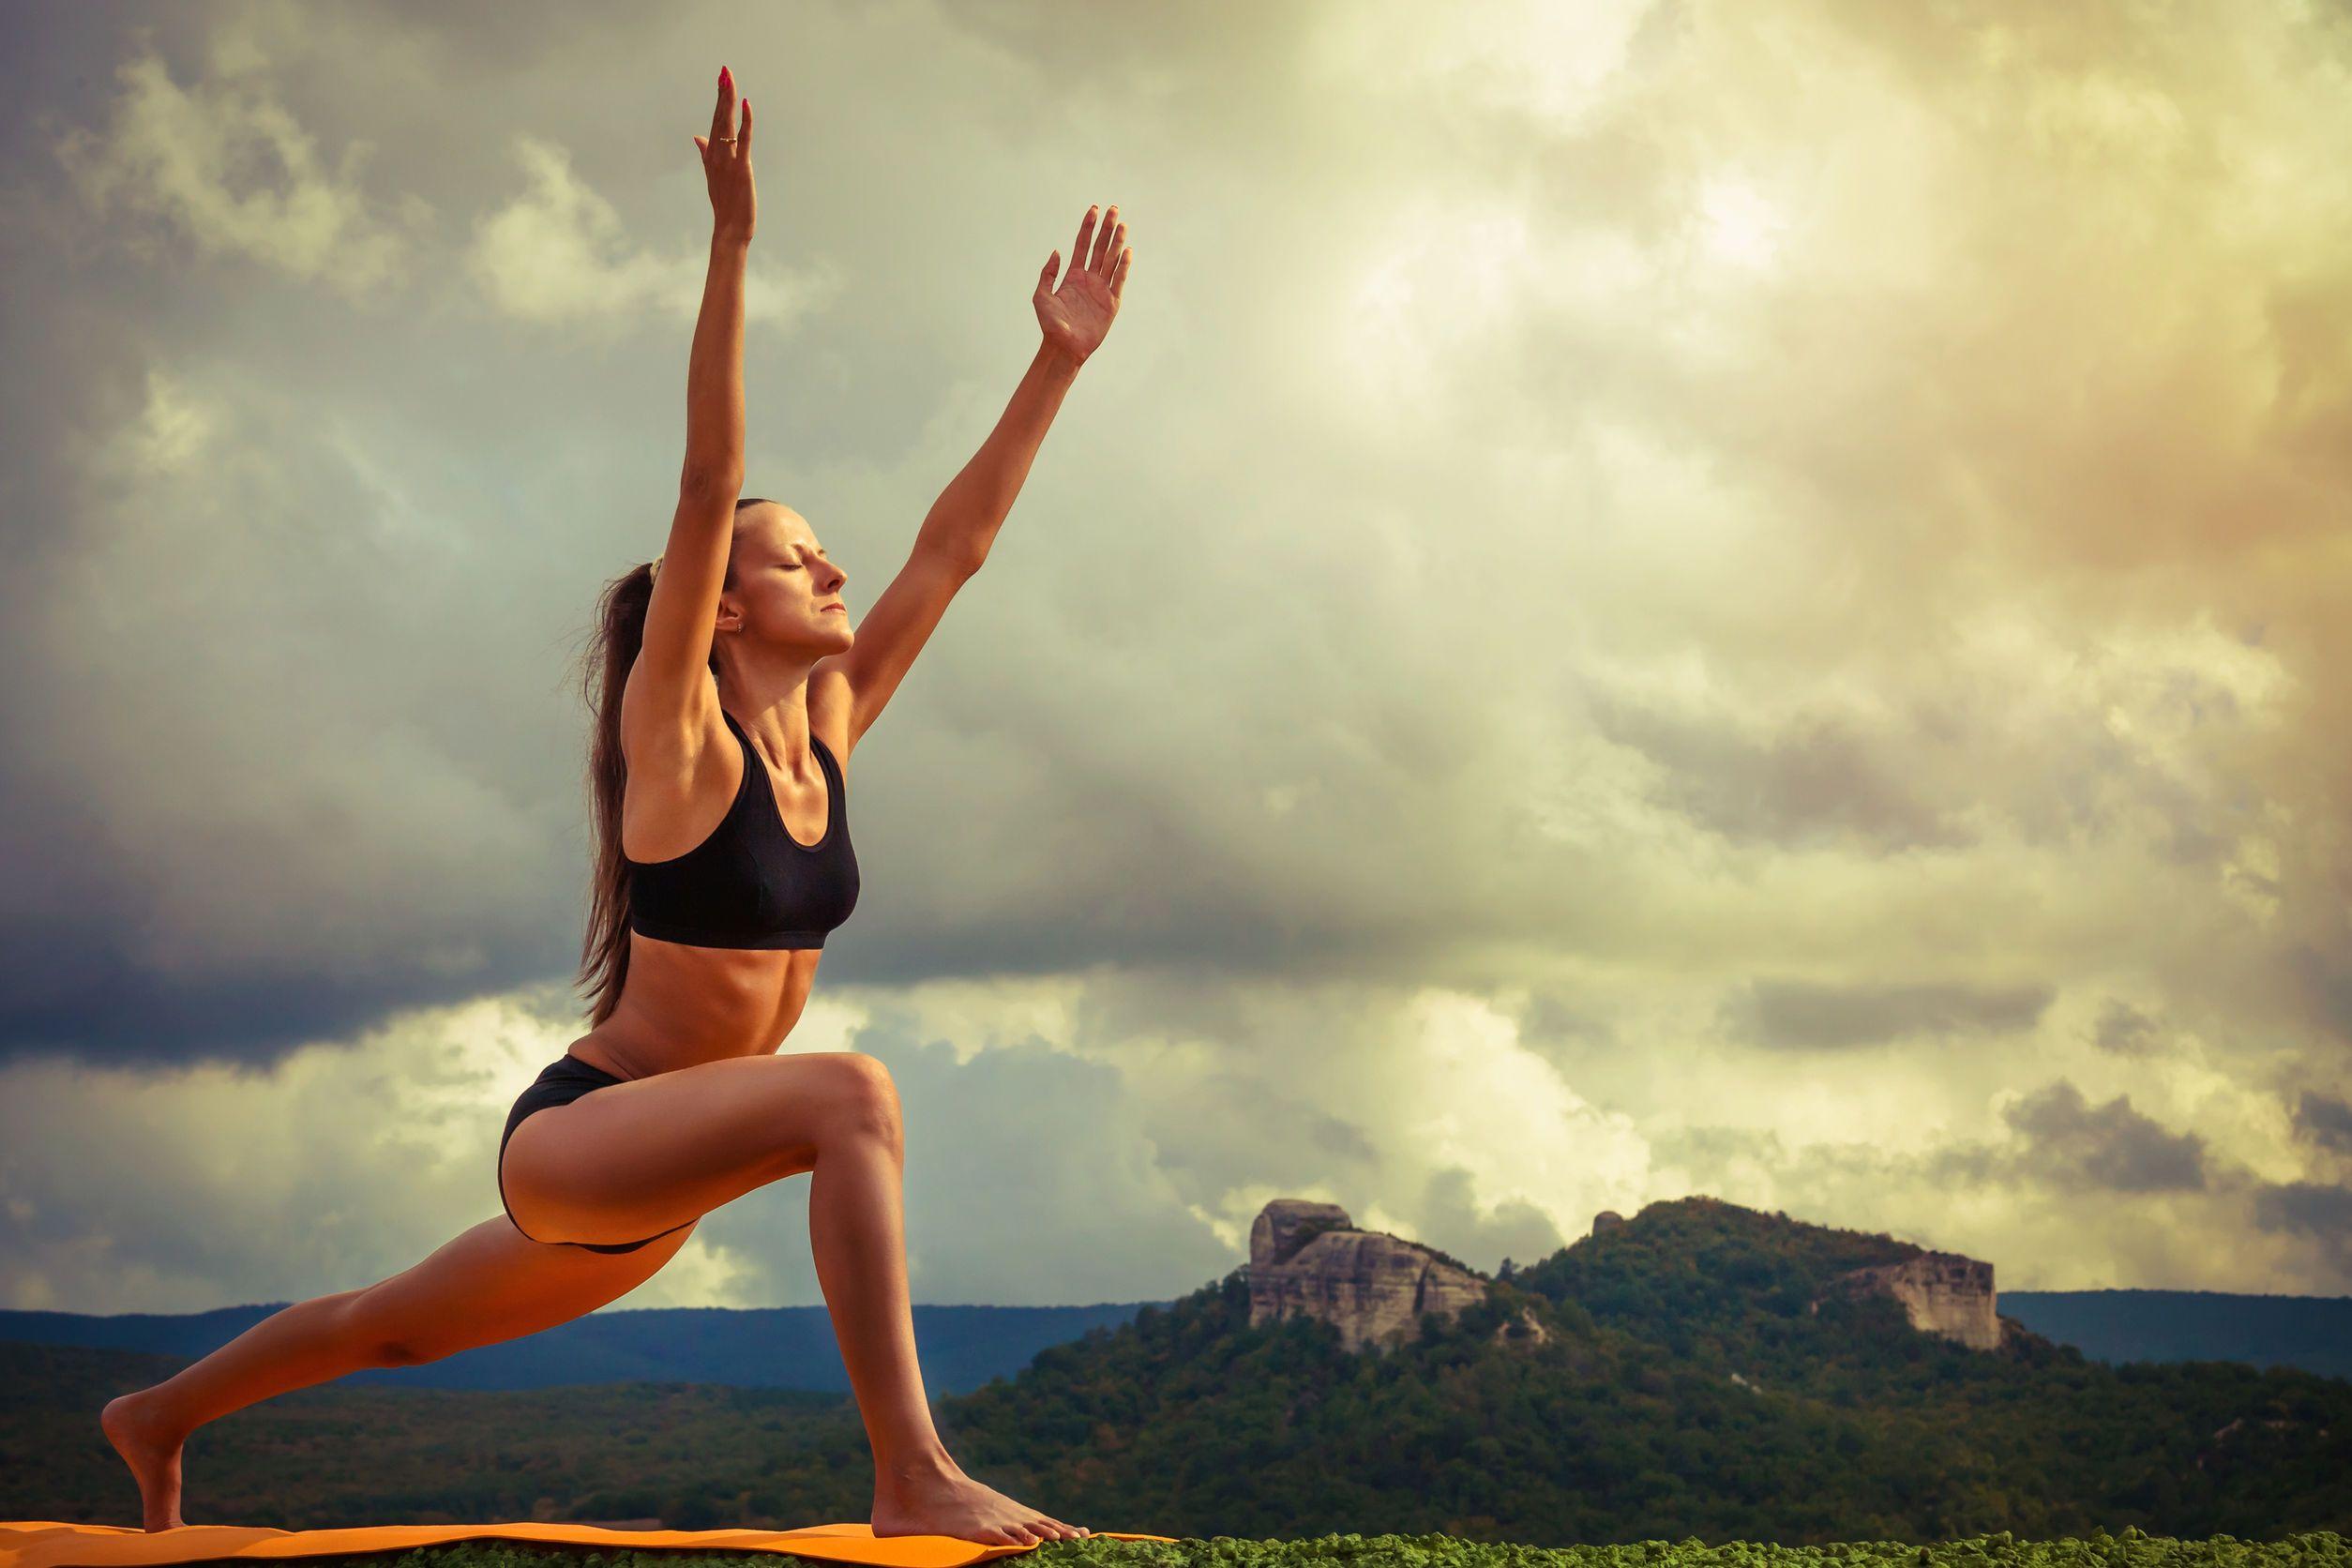 How To Do Surya Namaskar Sun Salutation Steps Amp Postures Surya Namaskar Yoga Sun Salutation Different Types Of Yoga